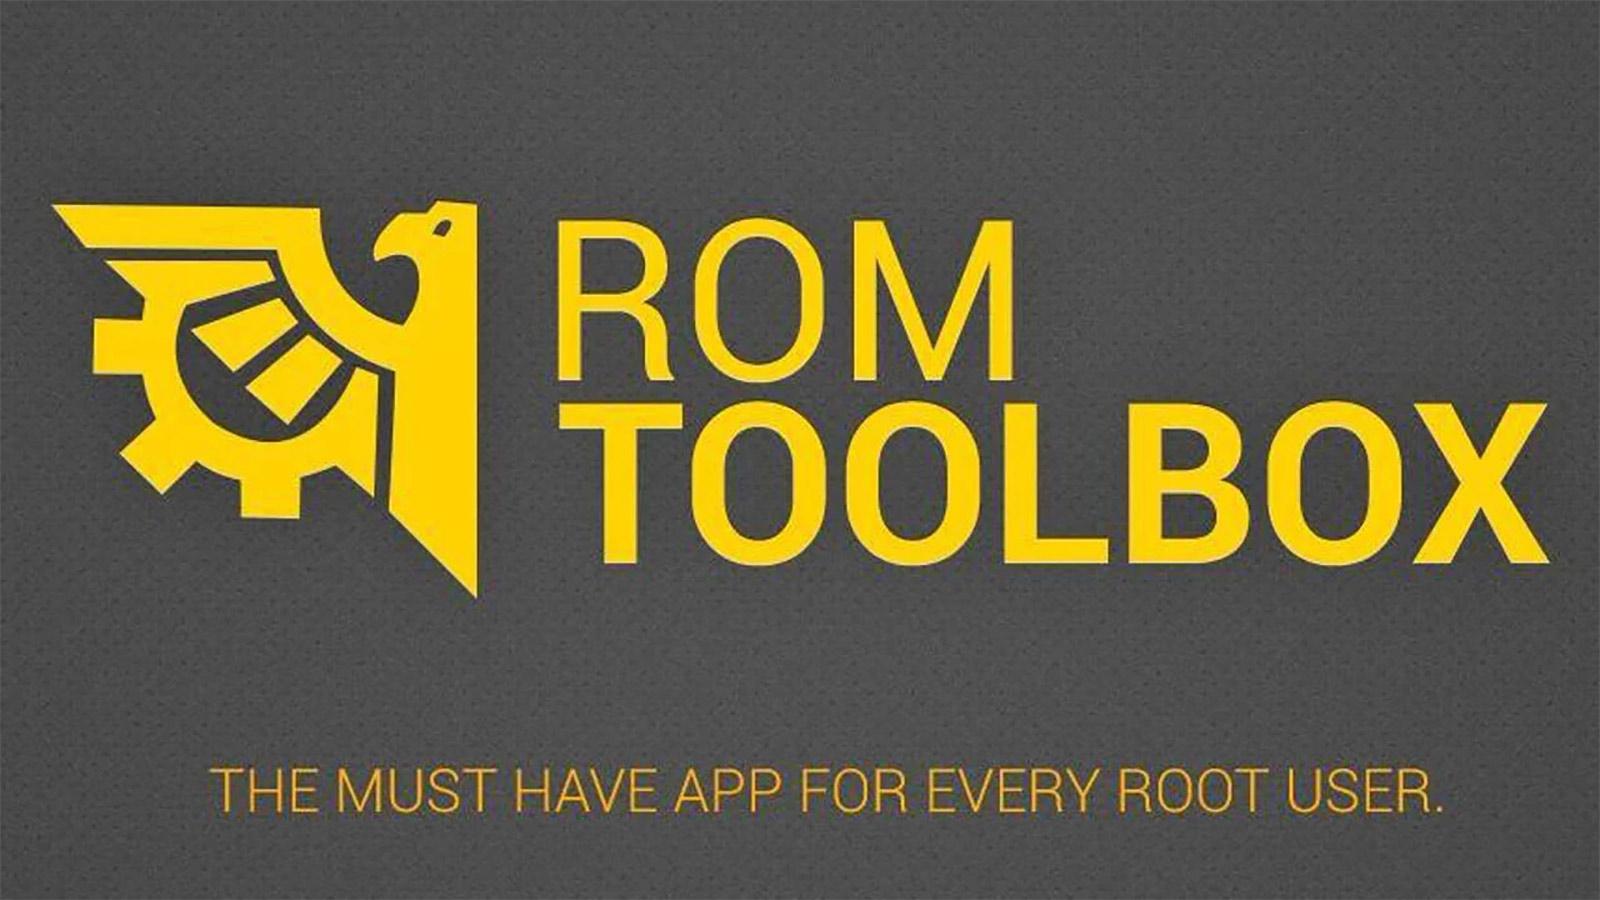 ROM Toolbox Pro Mod Apk 6.5.1.0 (Premium Unlocked)